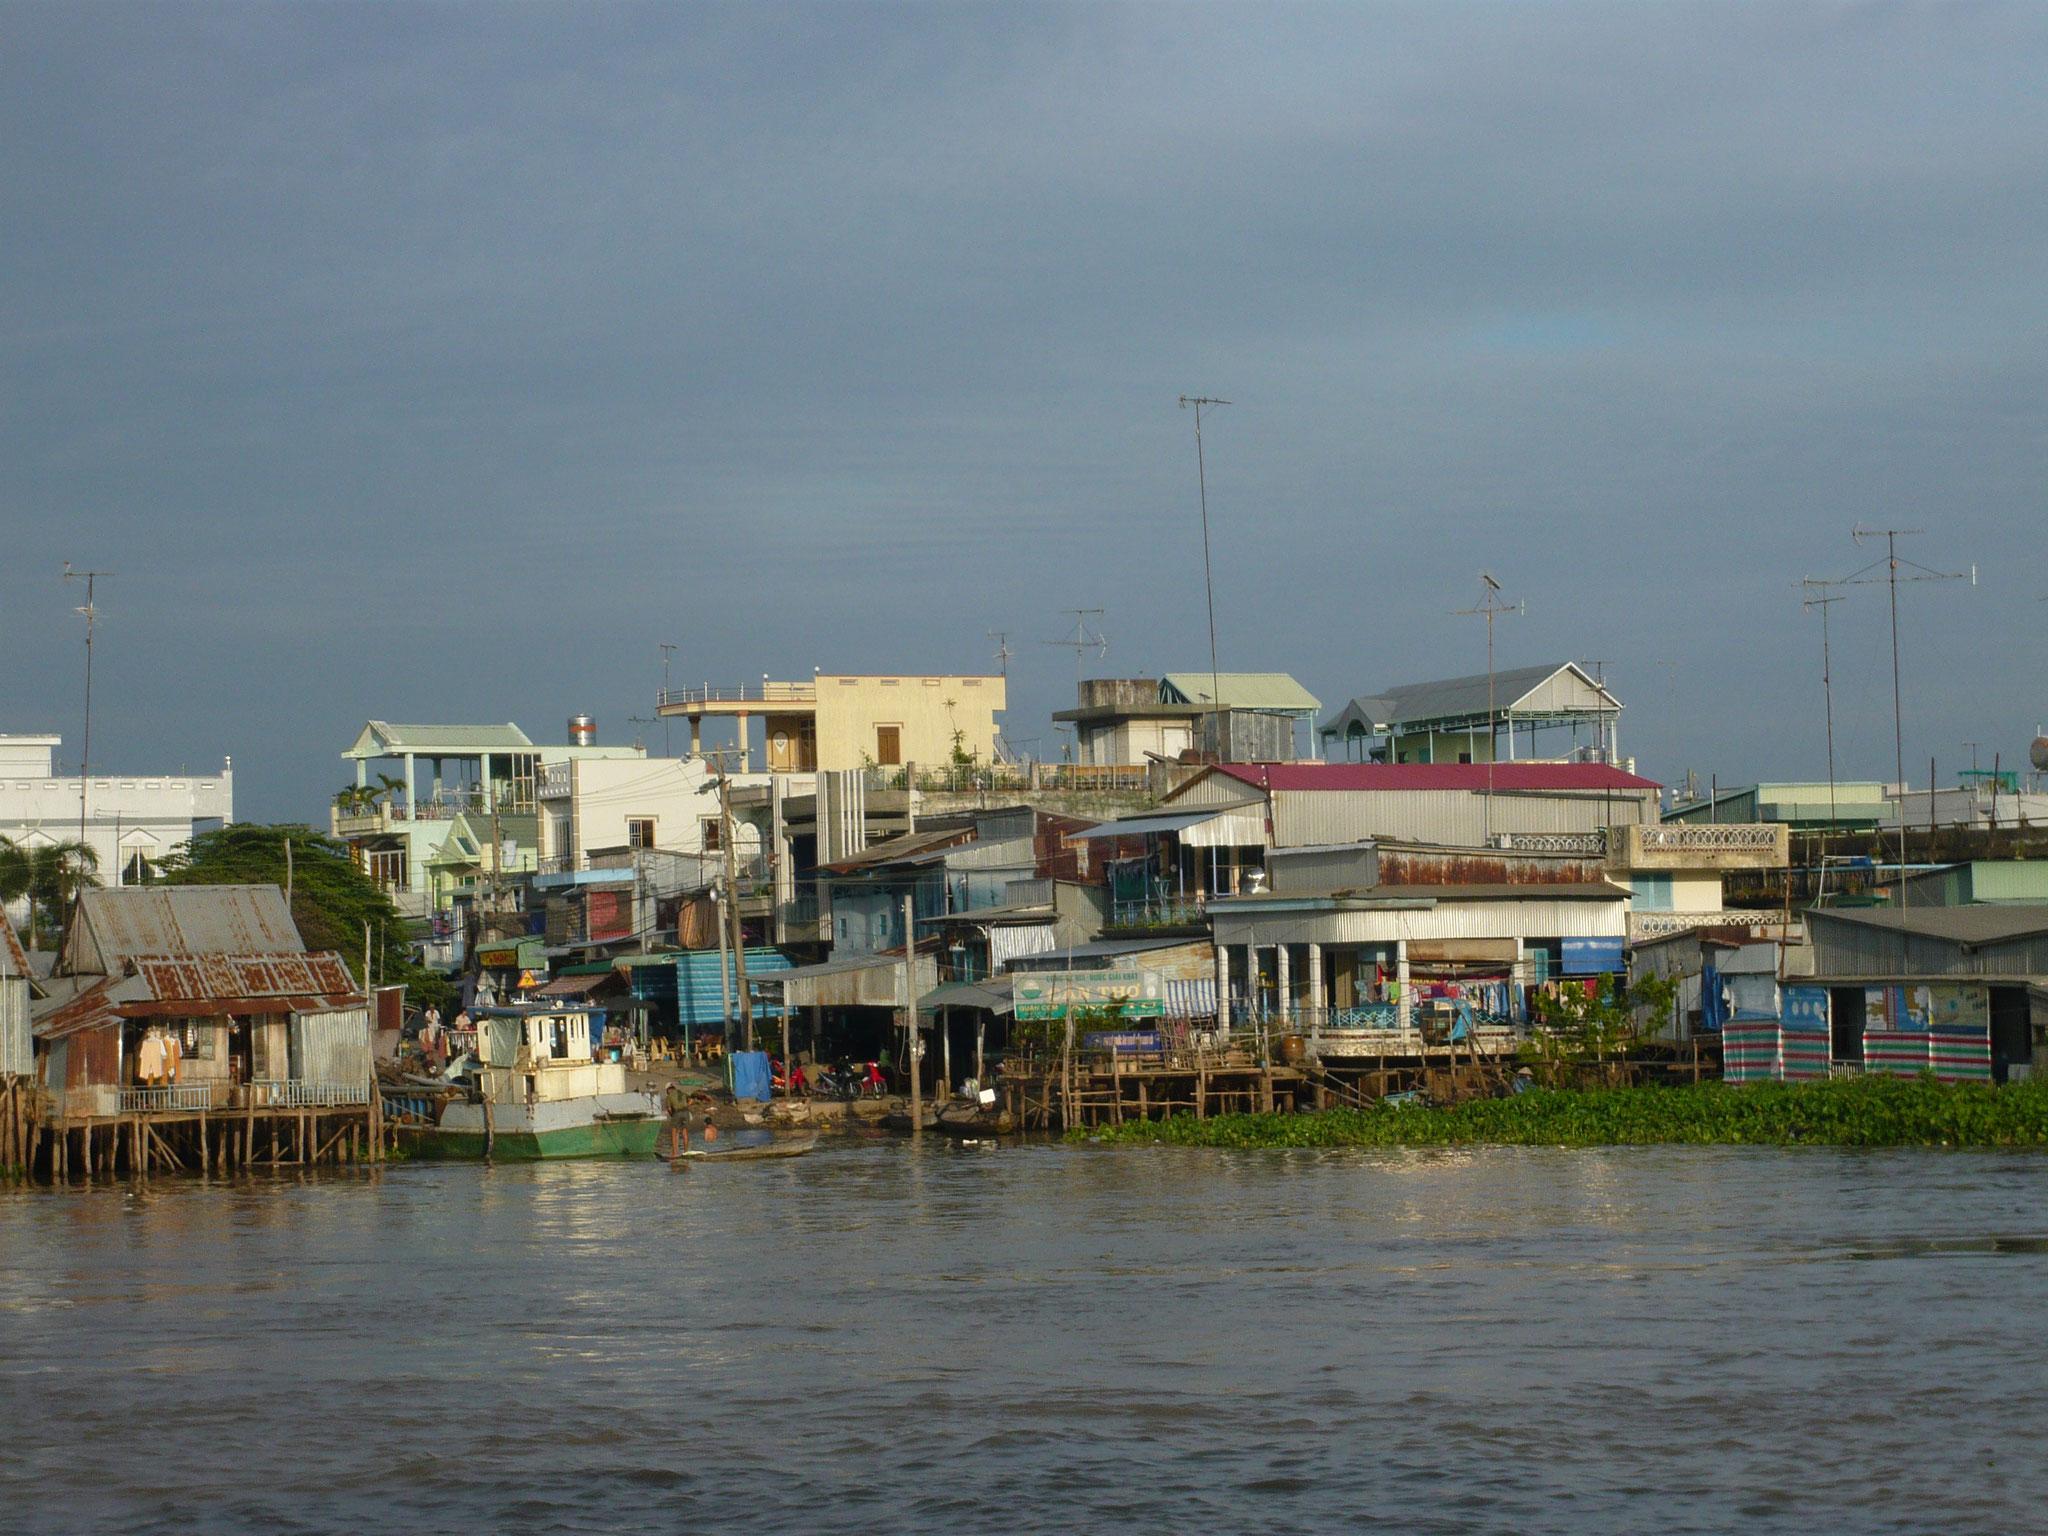 Kambodscha - Die Fahrt auf dem Mekong